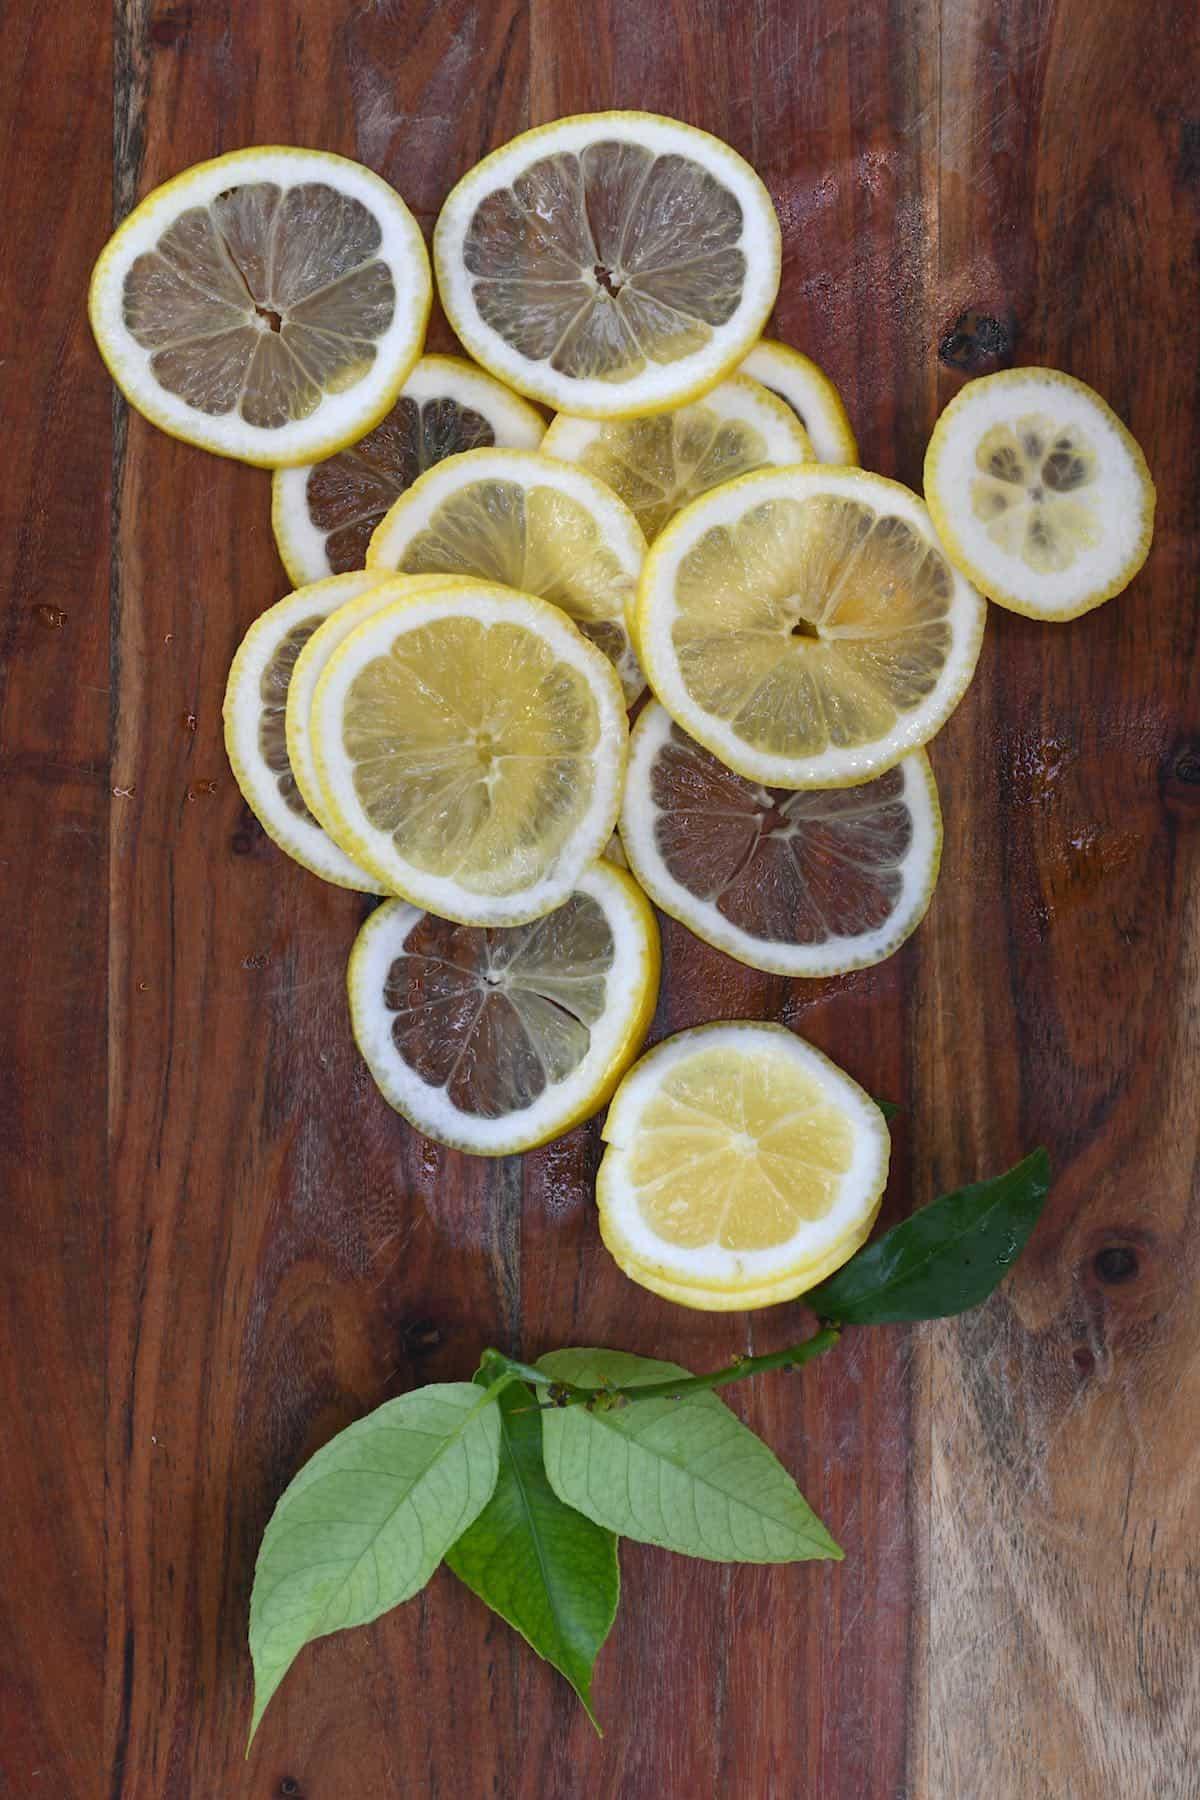 Thinly sliced lemon